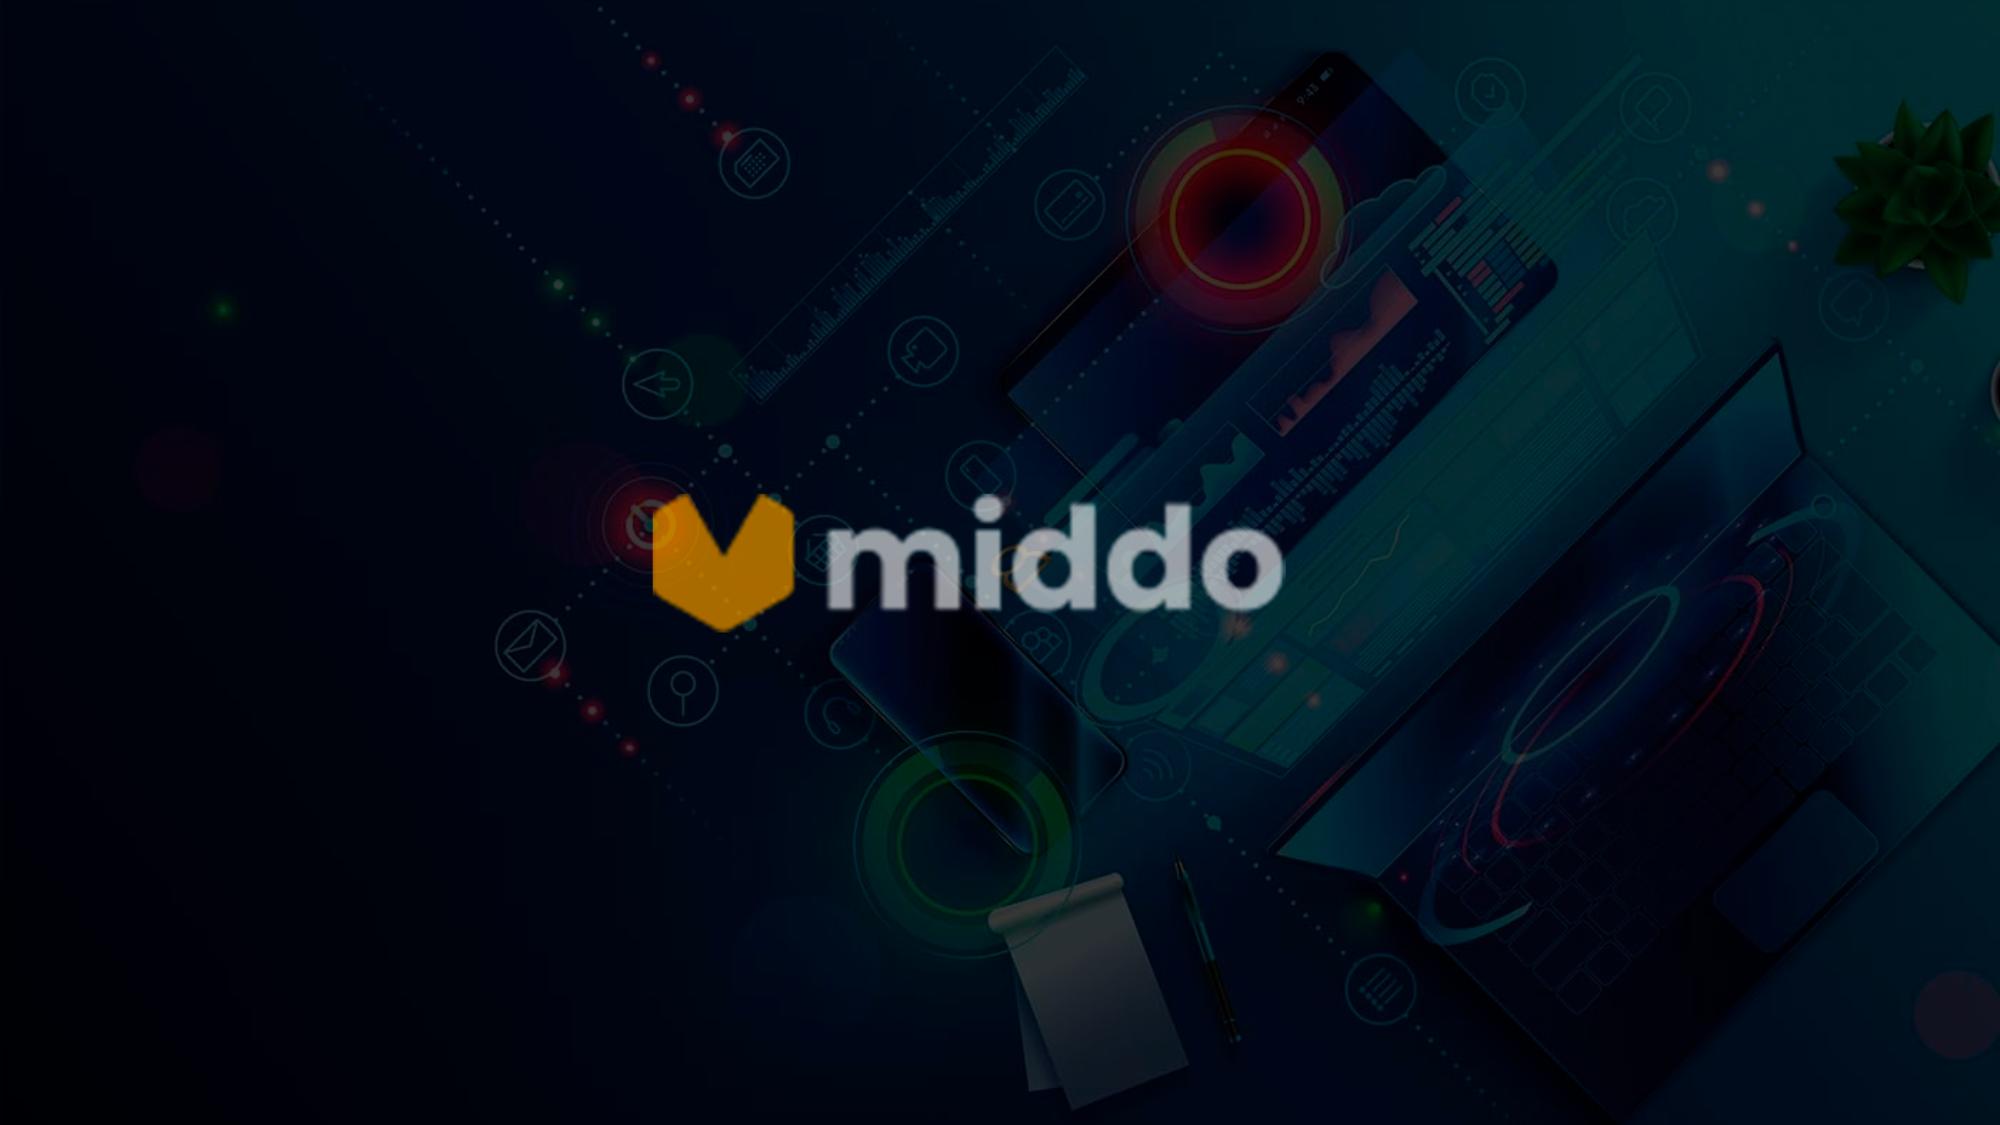 middo_services-1400x800